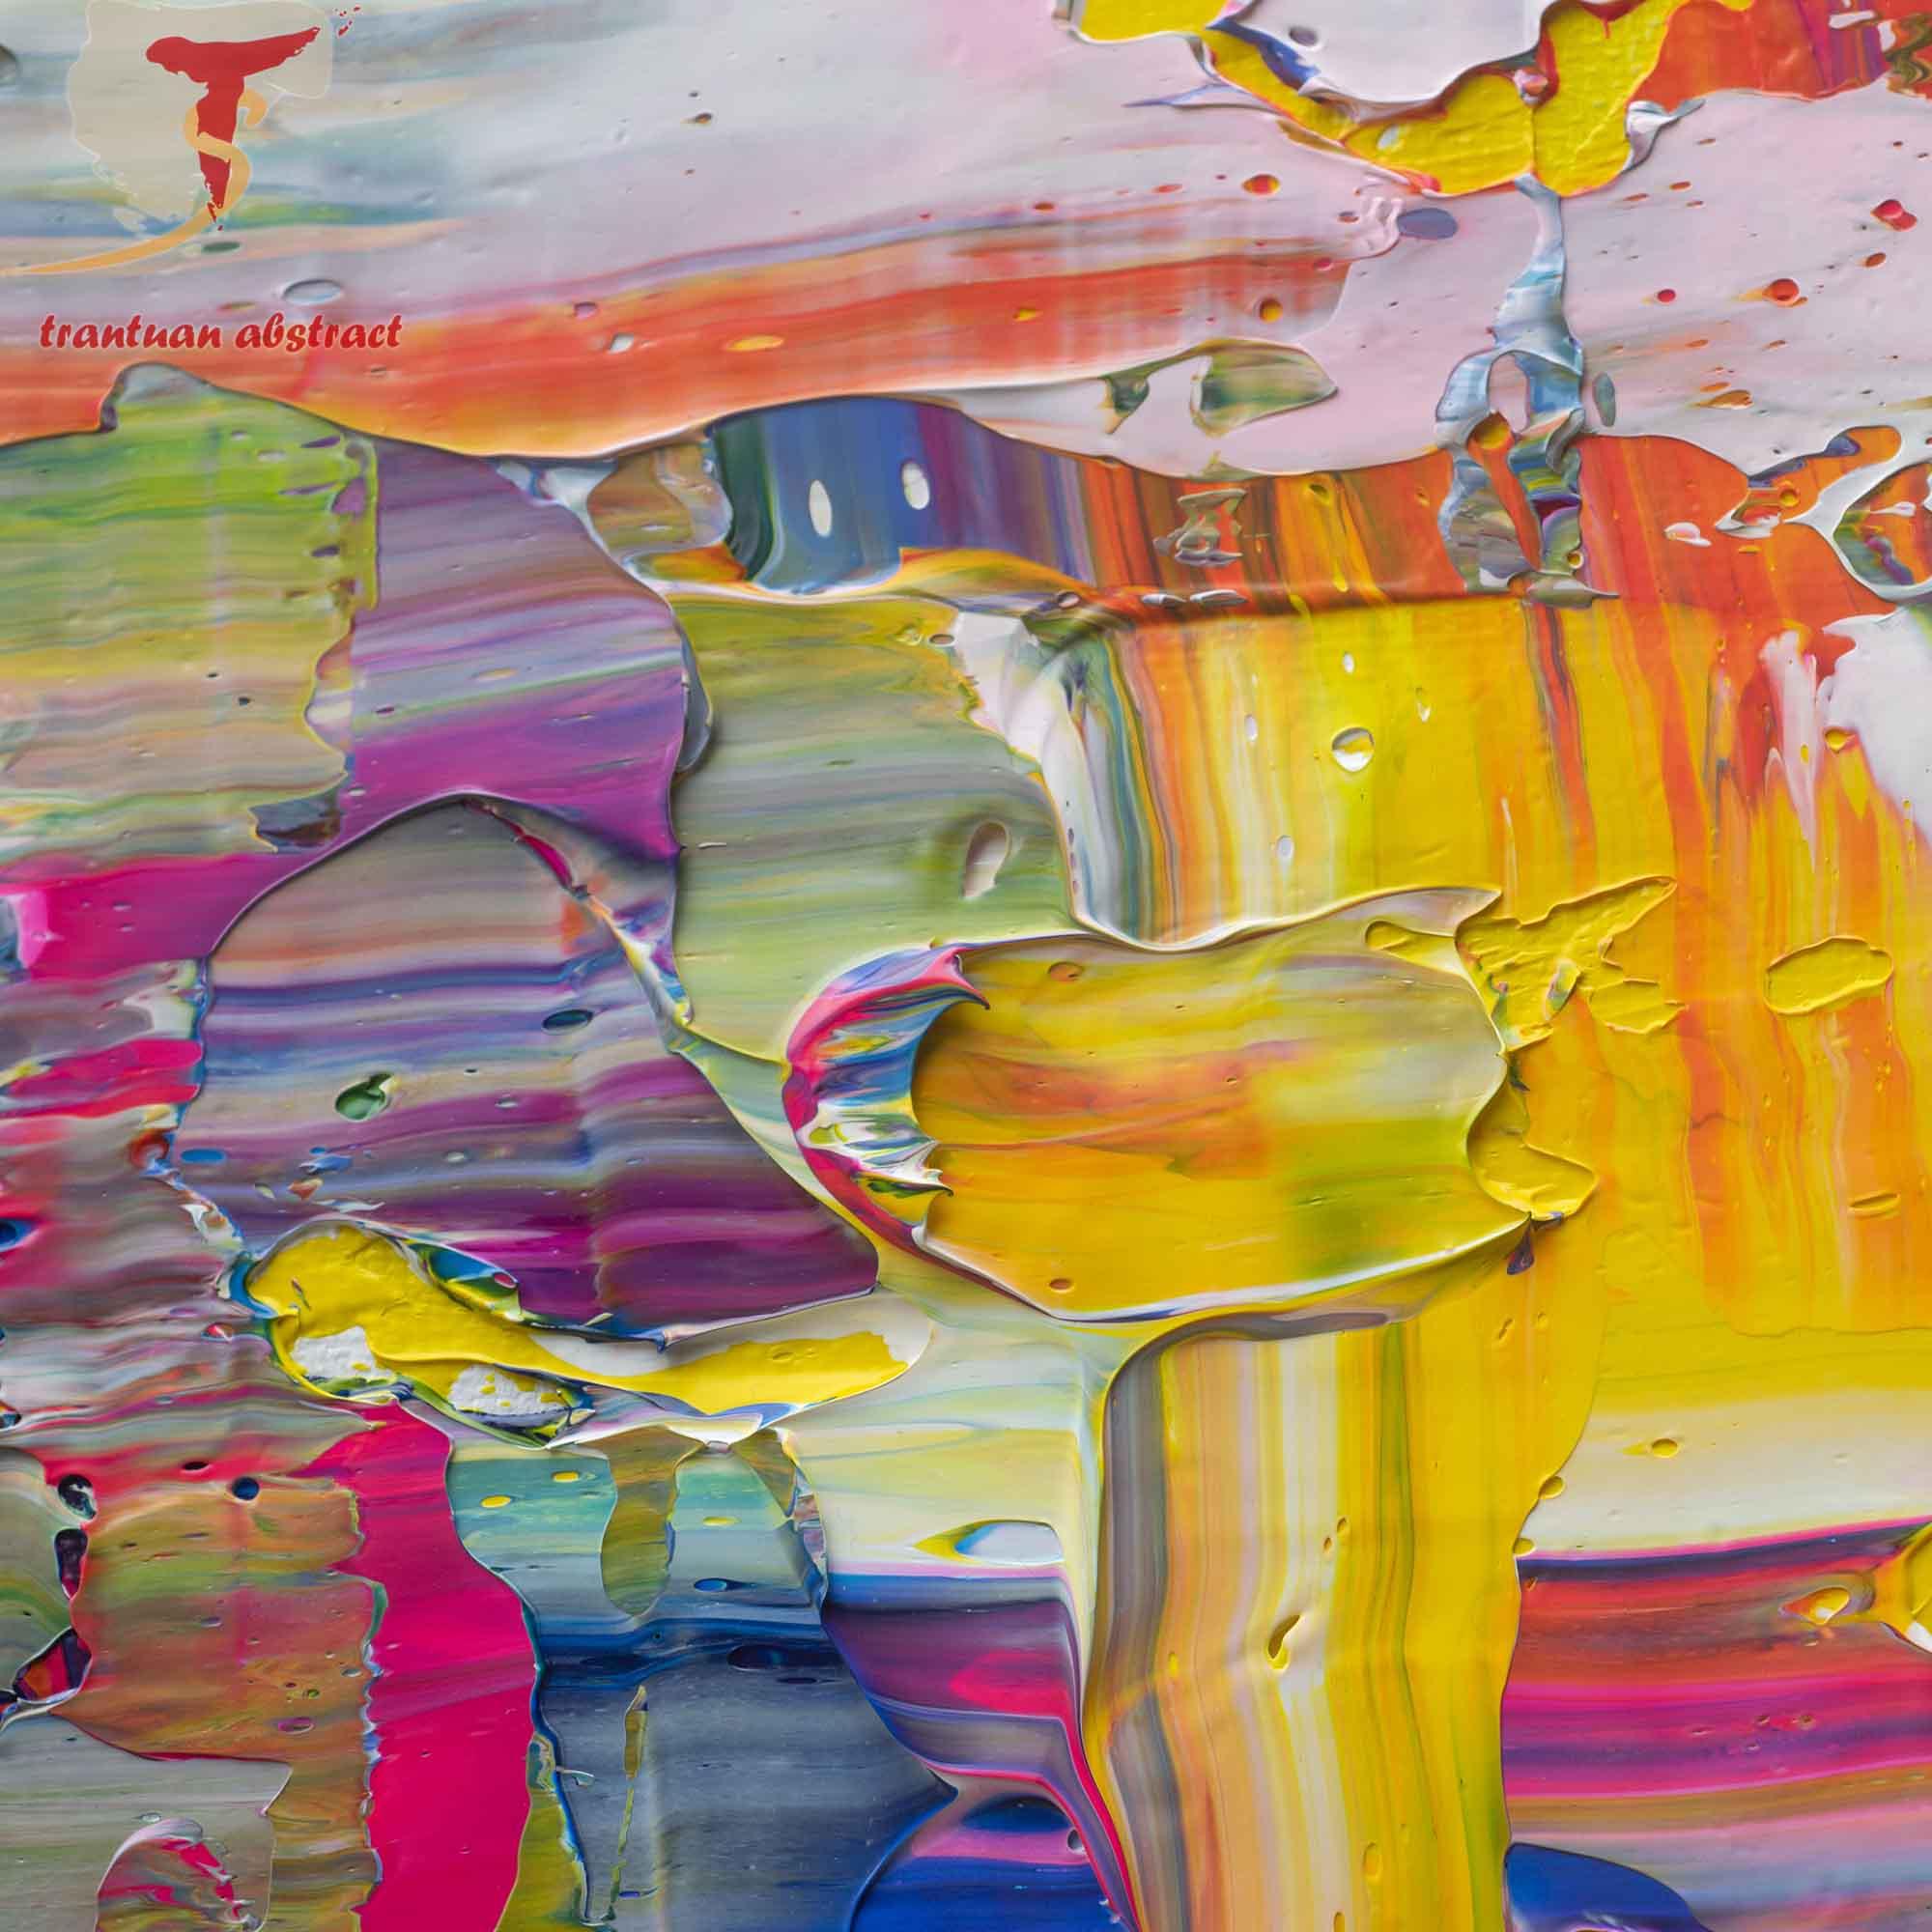 Tran Tuan Abstract Eternal Joy 135 x 80 x 5 cm Acrylic on Canvas Painting Detail (1)